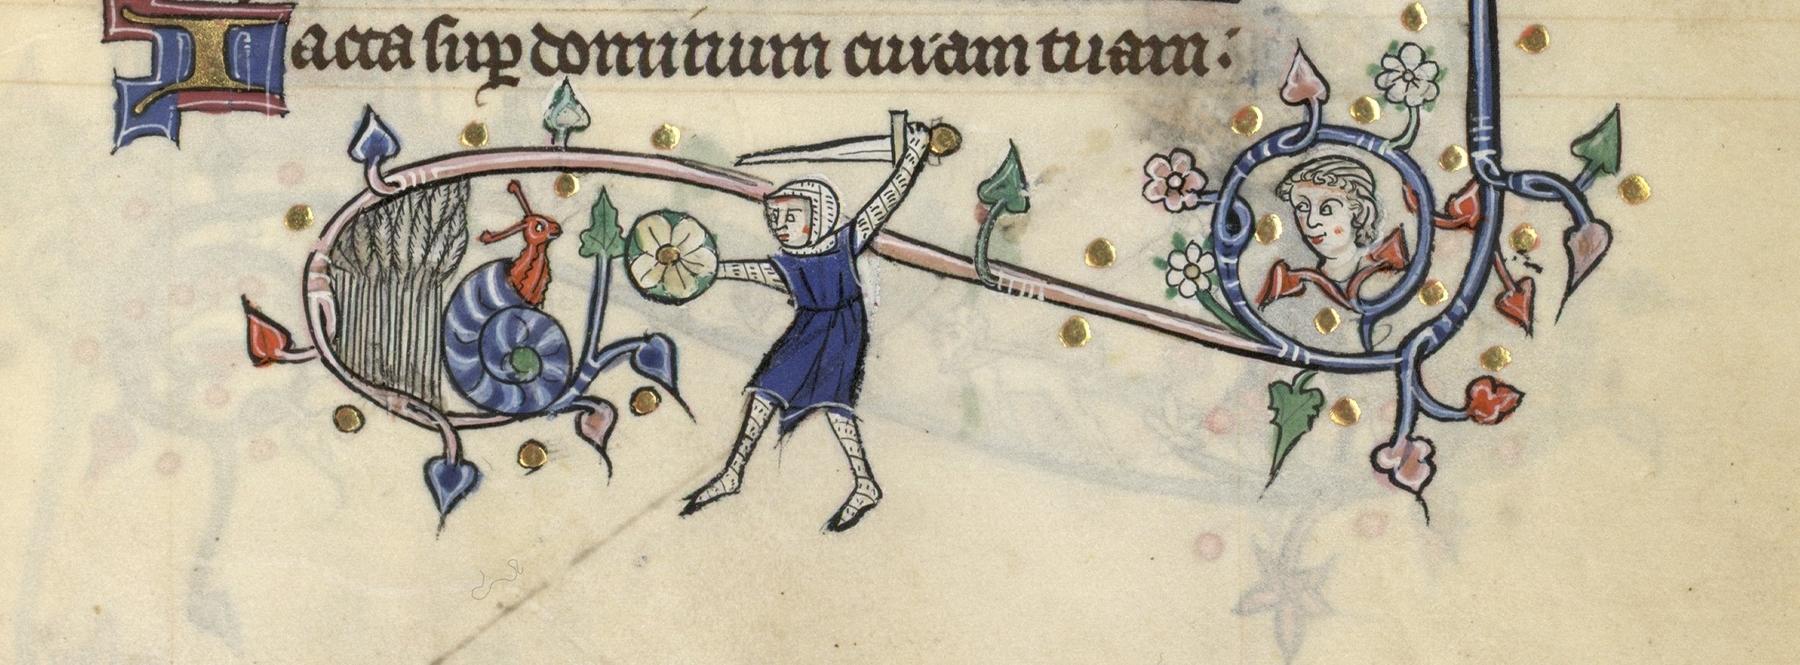 Contenu du Un chevalier combat un escargot